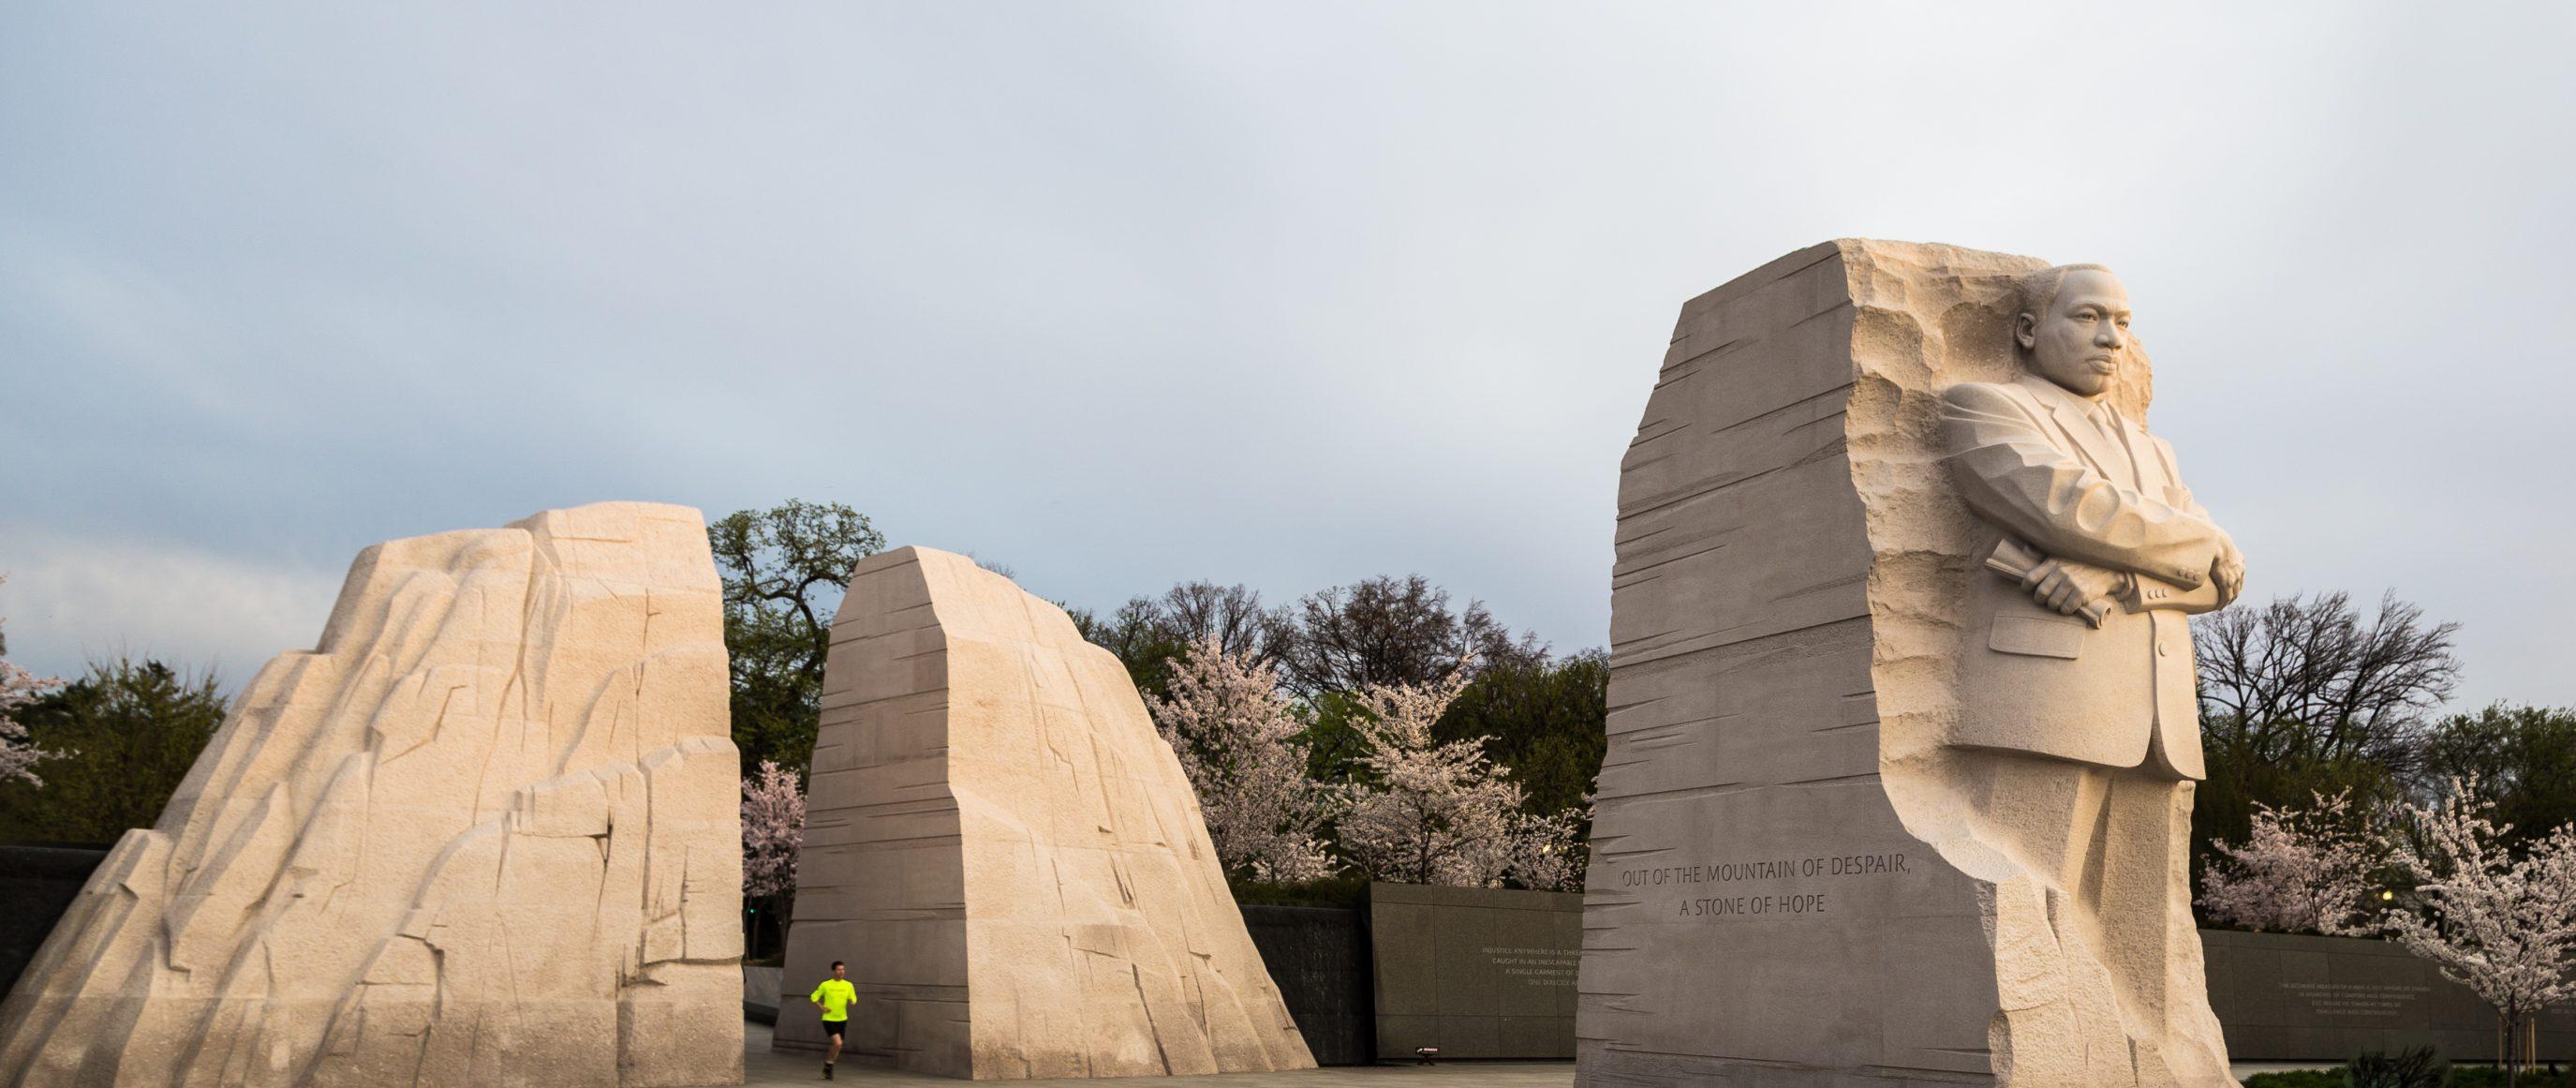 Martin Luther King, Jr. Memorial - Washington DC [Photos]